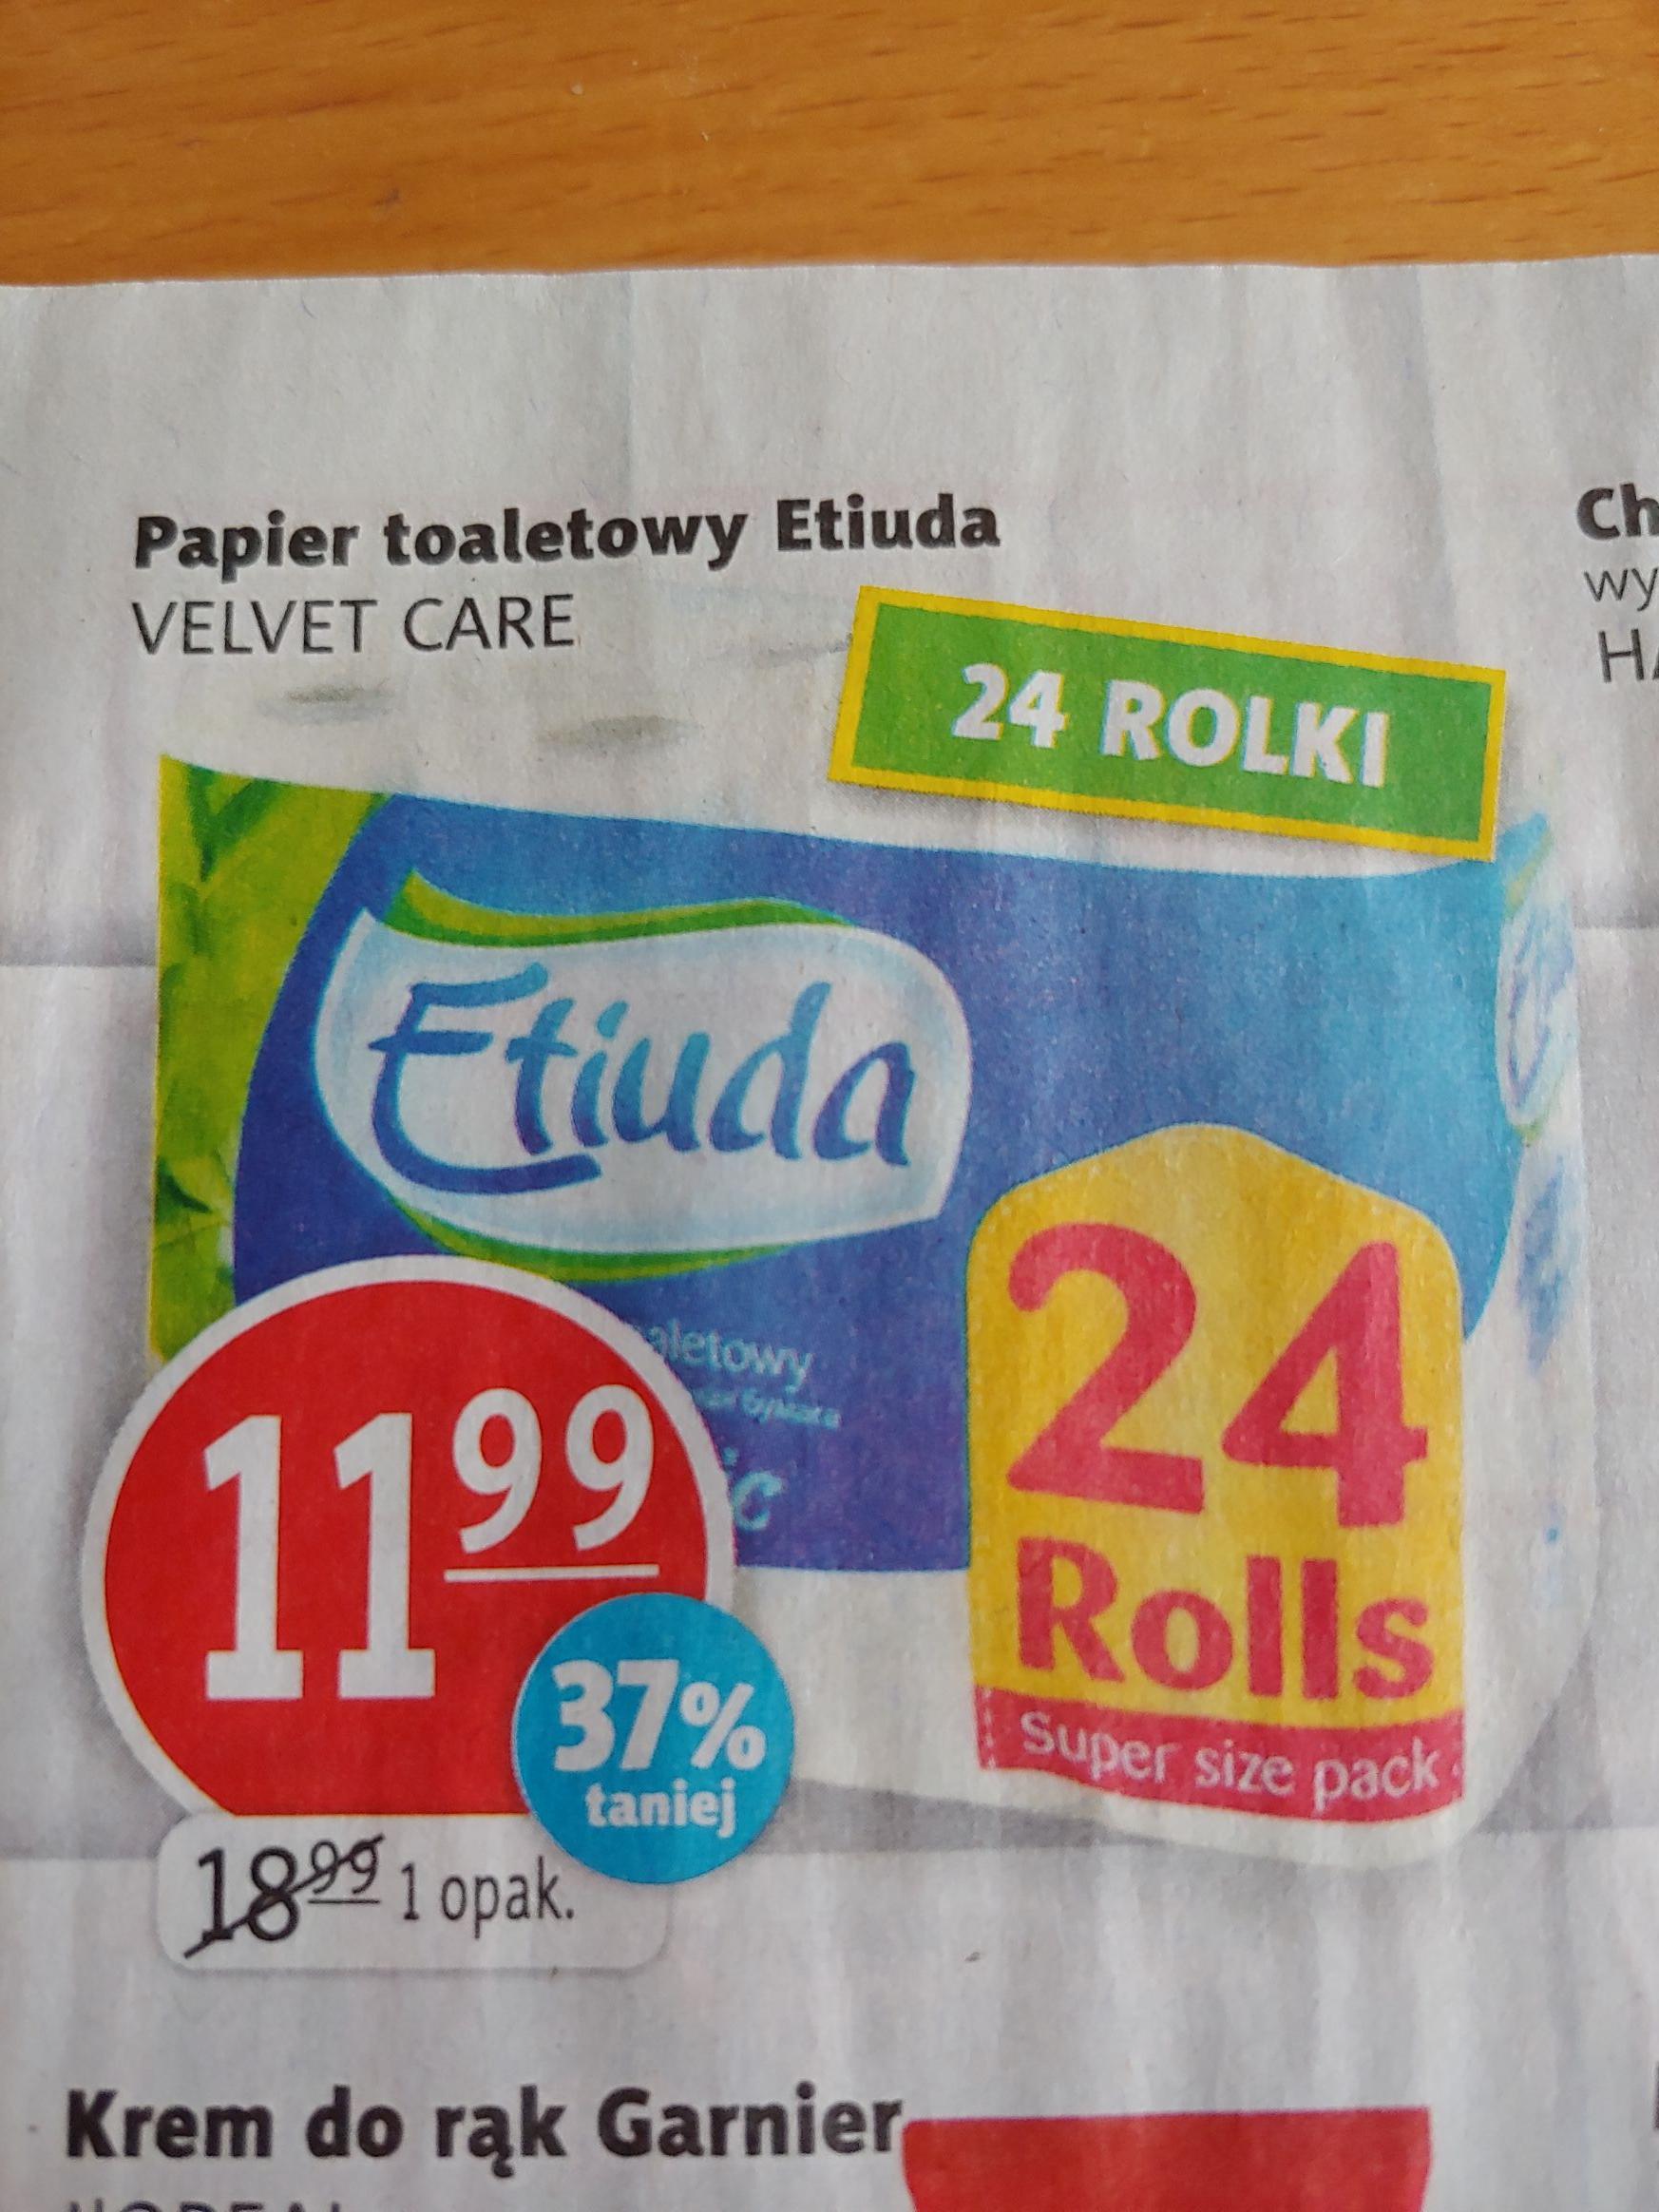 Papier toaletowy Etiuda 24 rolki- prim market